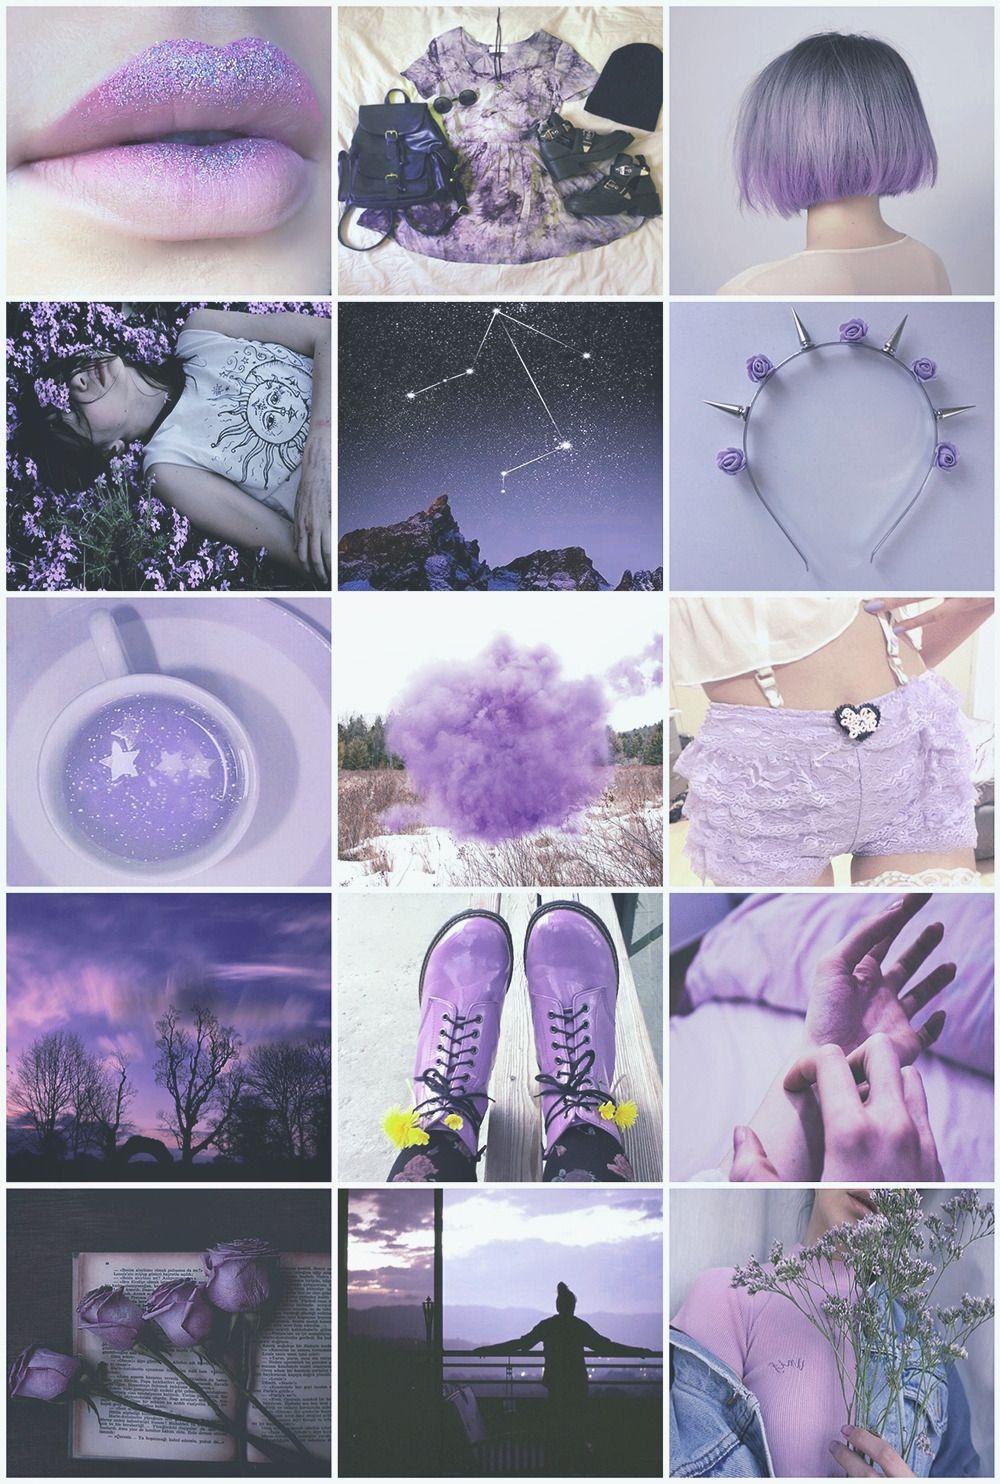 Pintura Tumblr wallpaper by N3R34 - e1 - Free on ZEDGE™